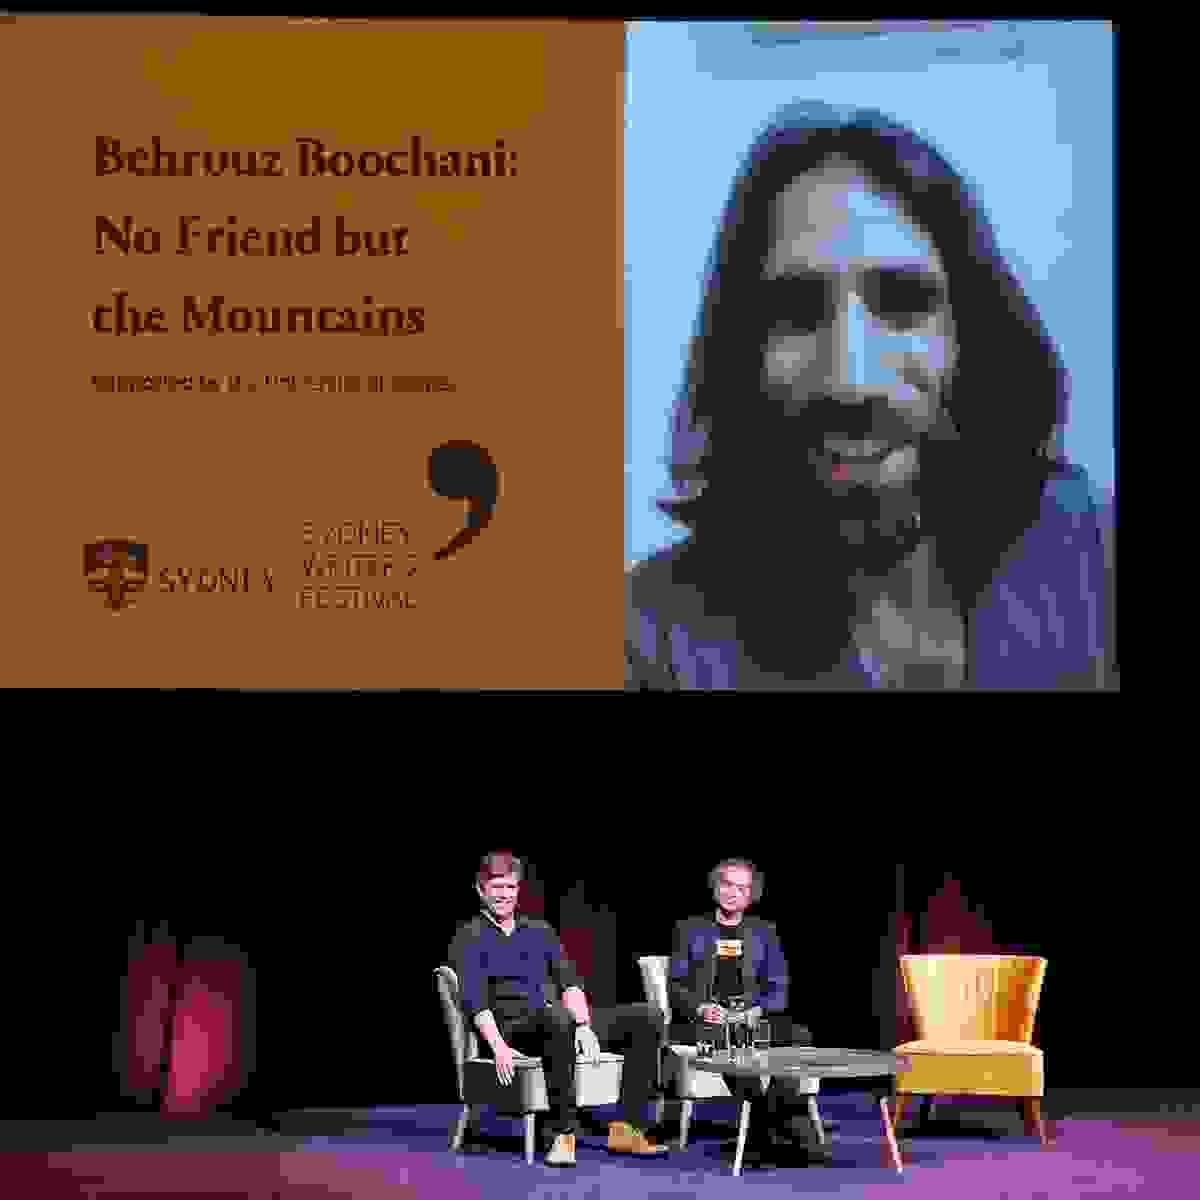 Listen: Behrouz Boochani: No Friend but the Mountains